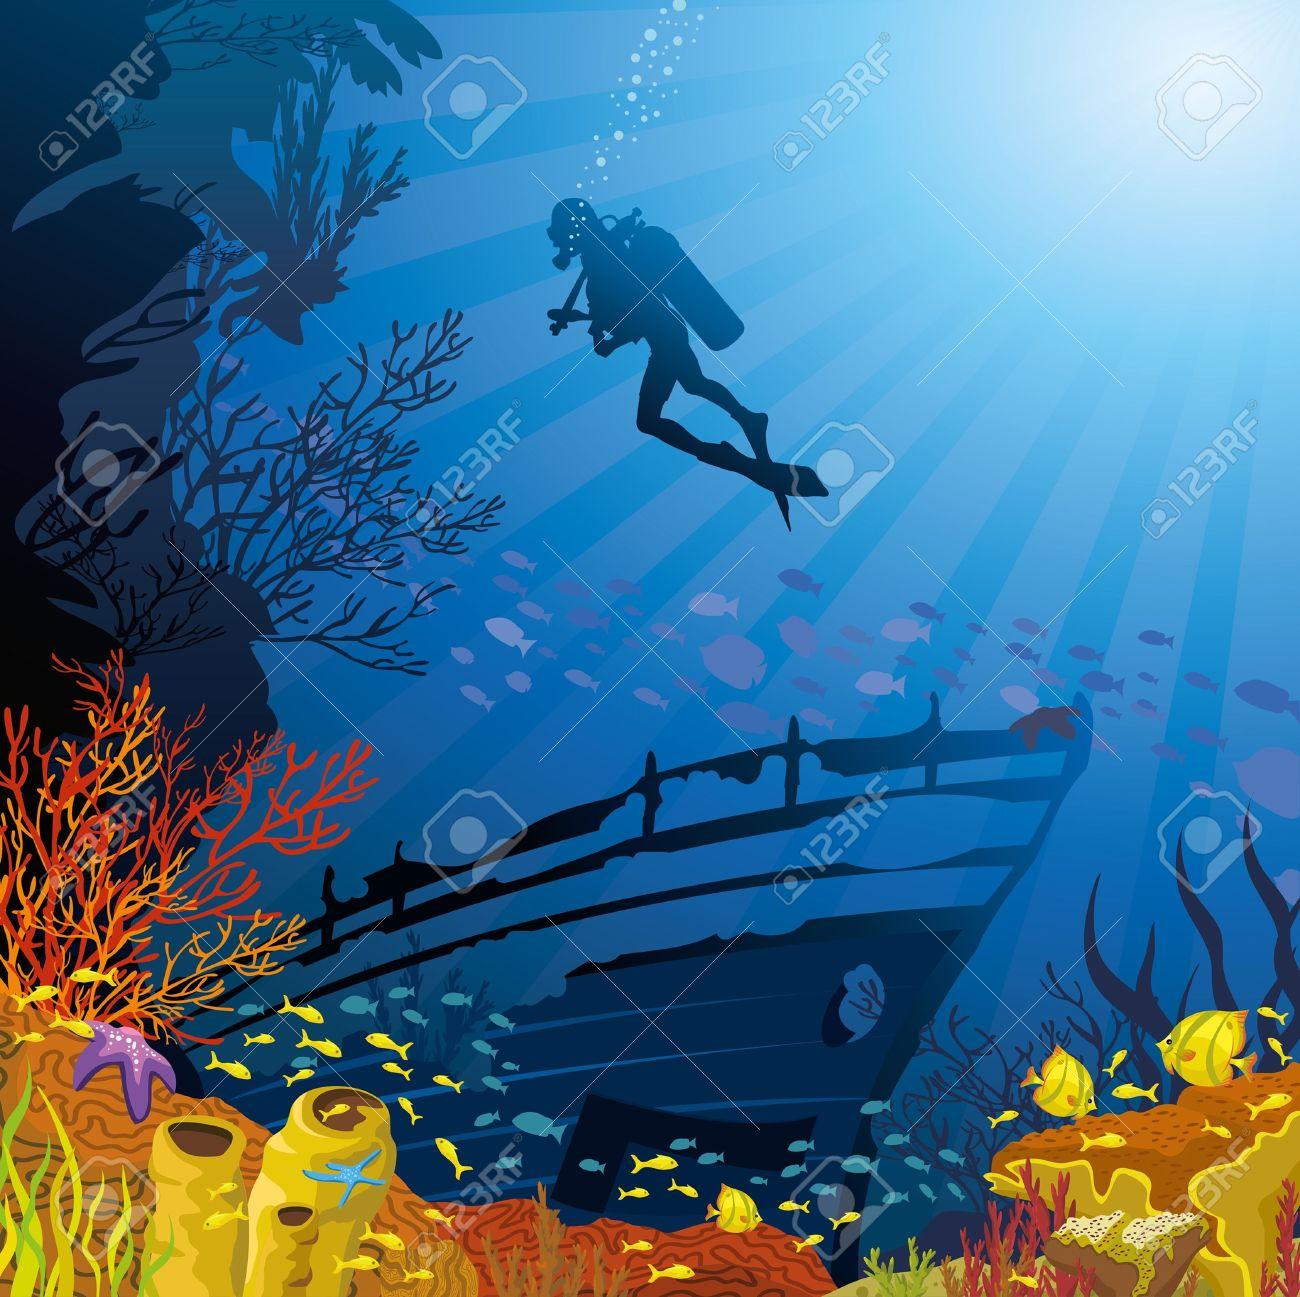 Deep sea clipart.